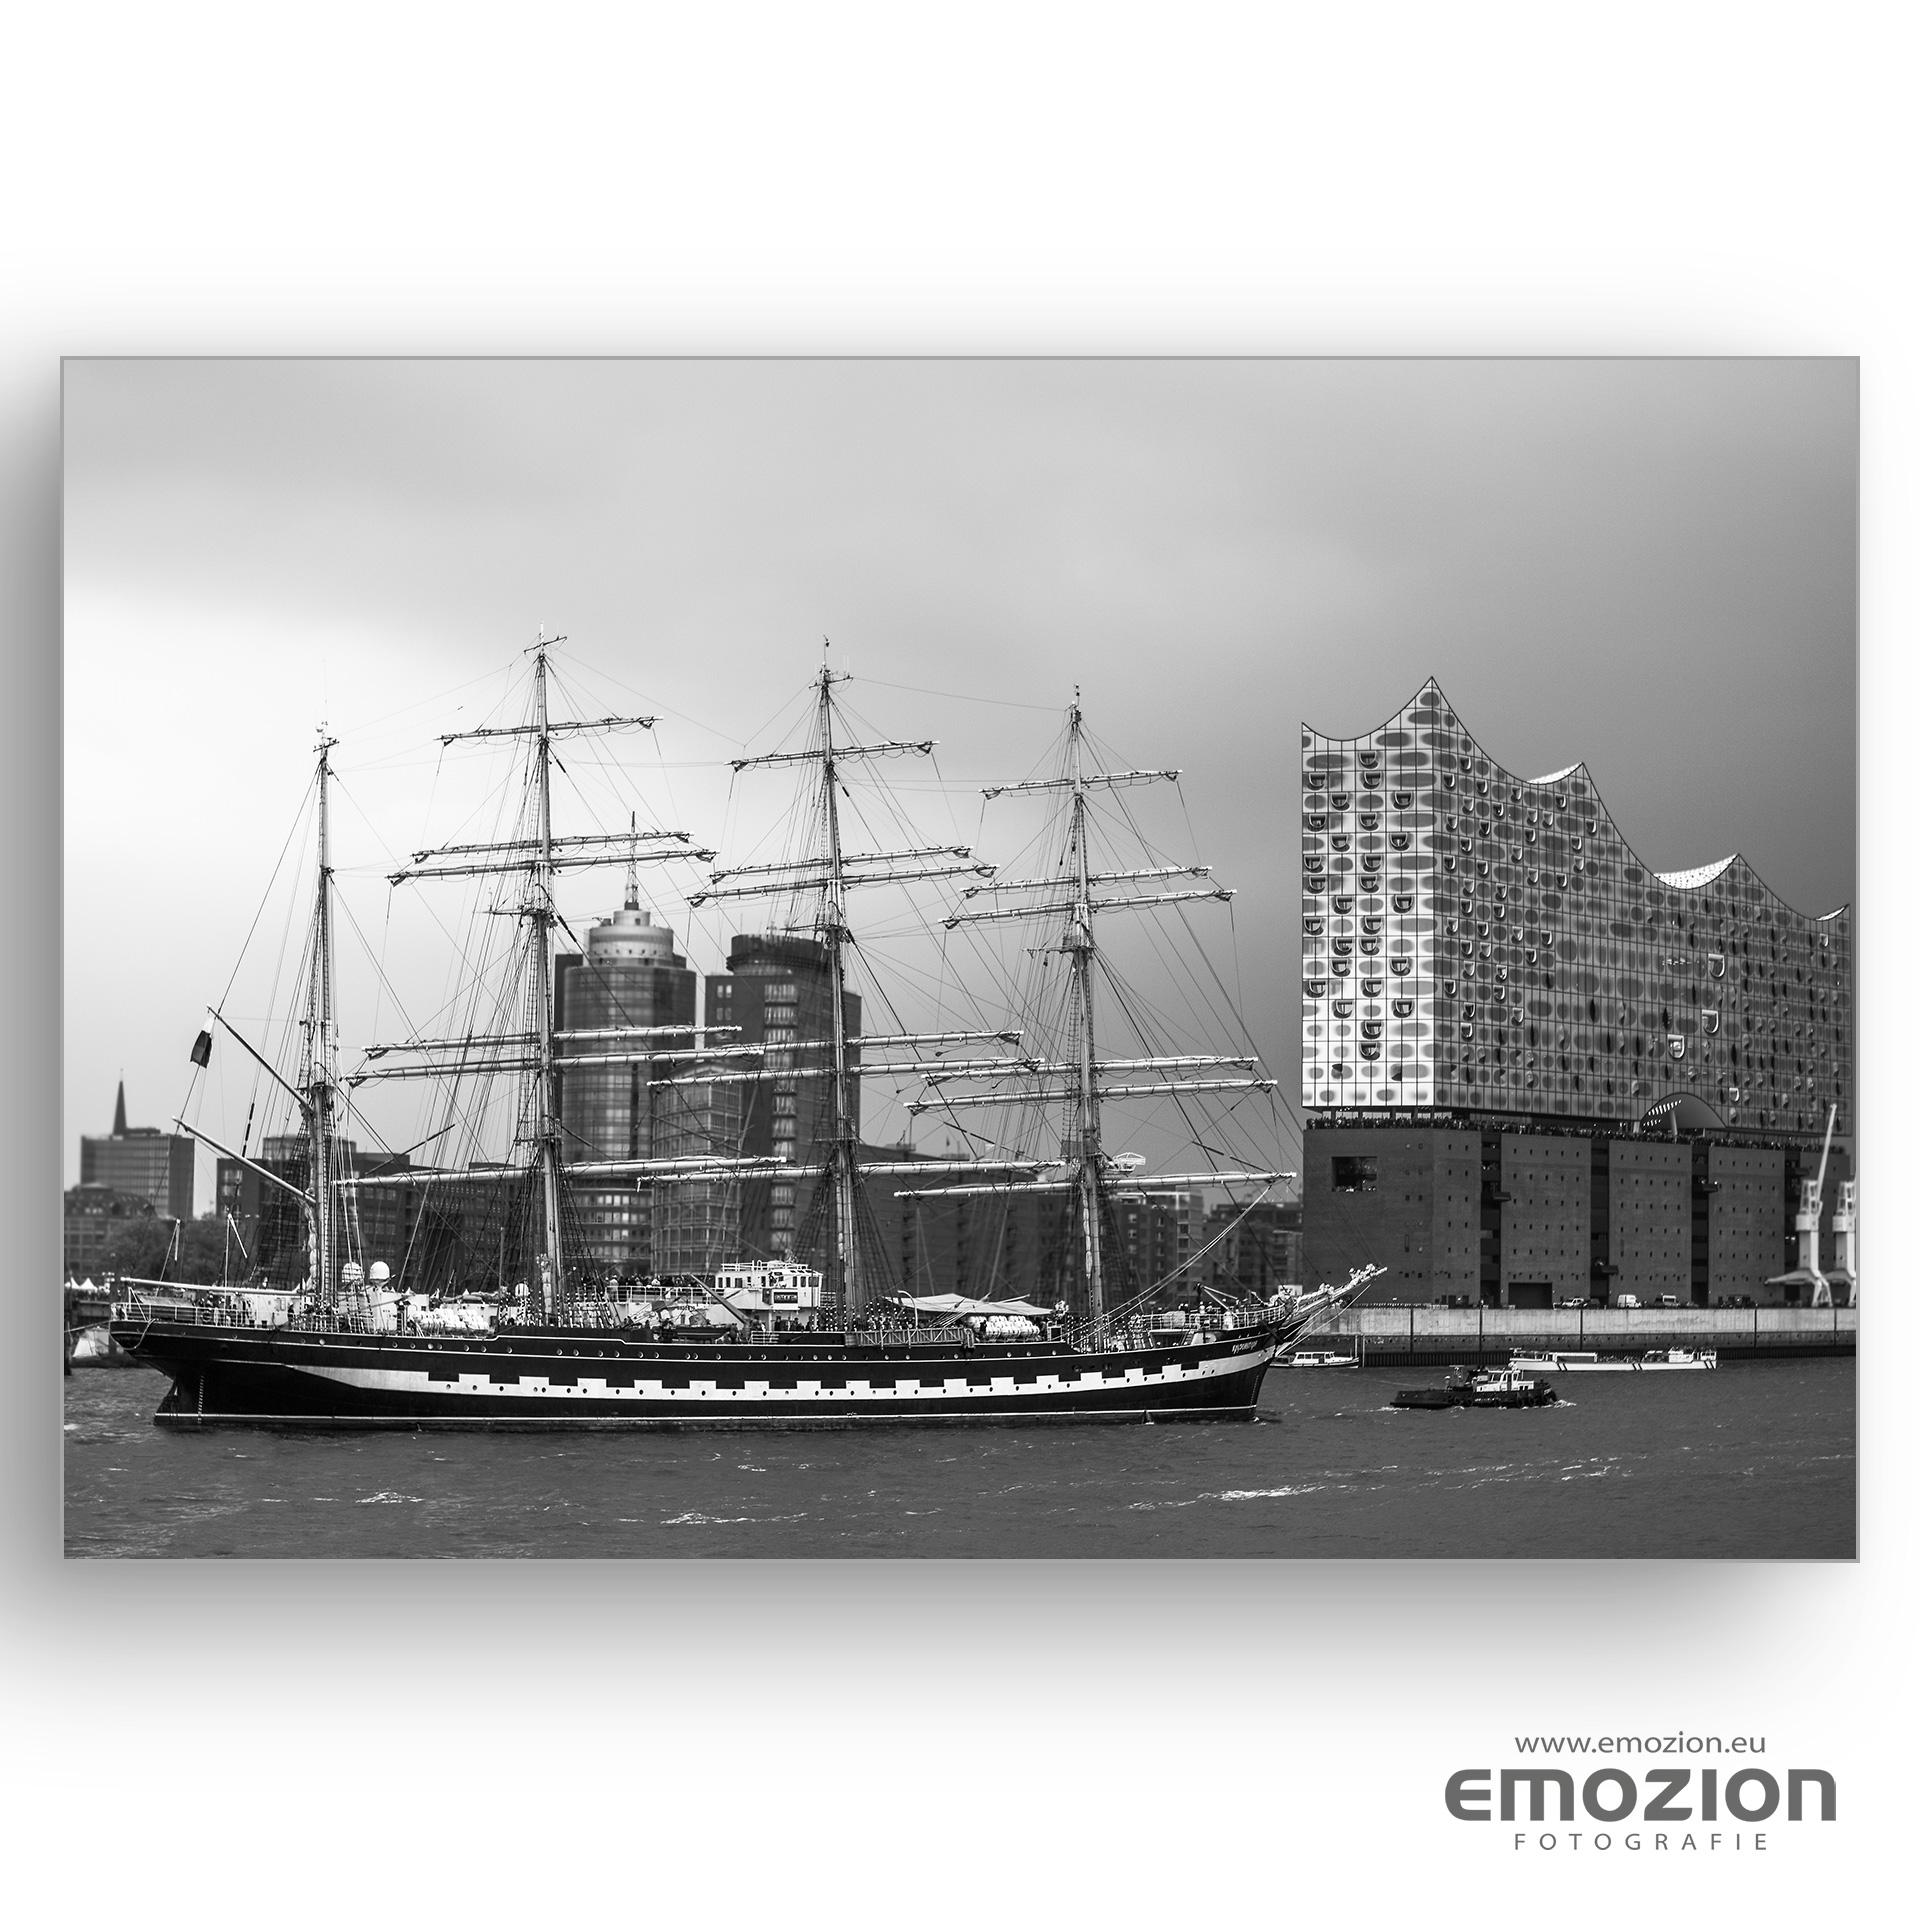 Elbphilharmonie Hamburg mitSegelschiff - EMOZION - Fotograf Sascha Block